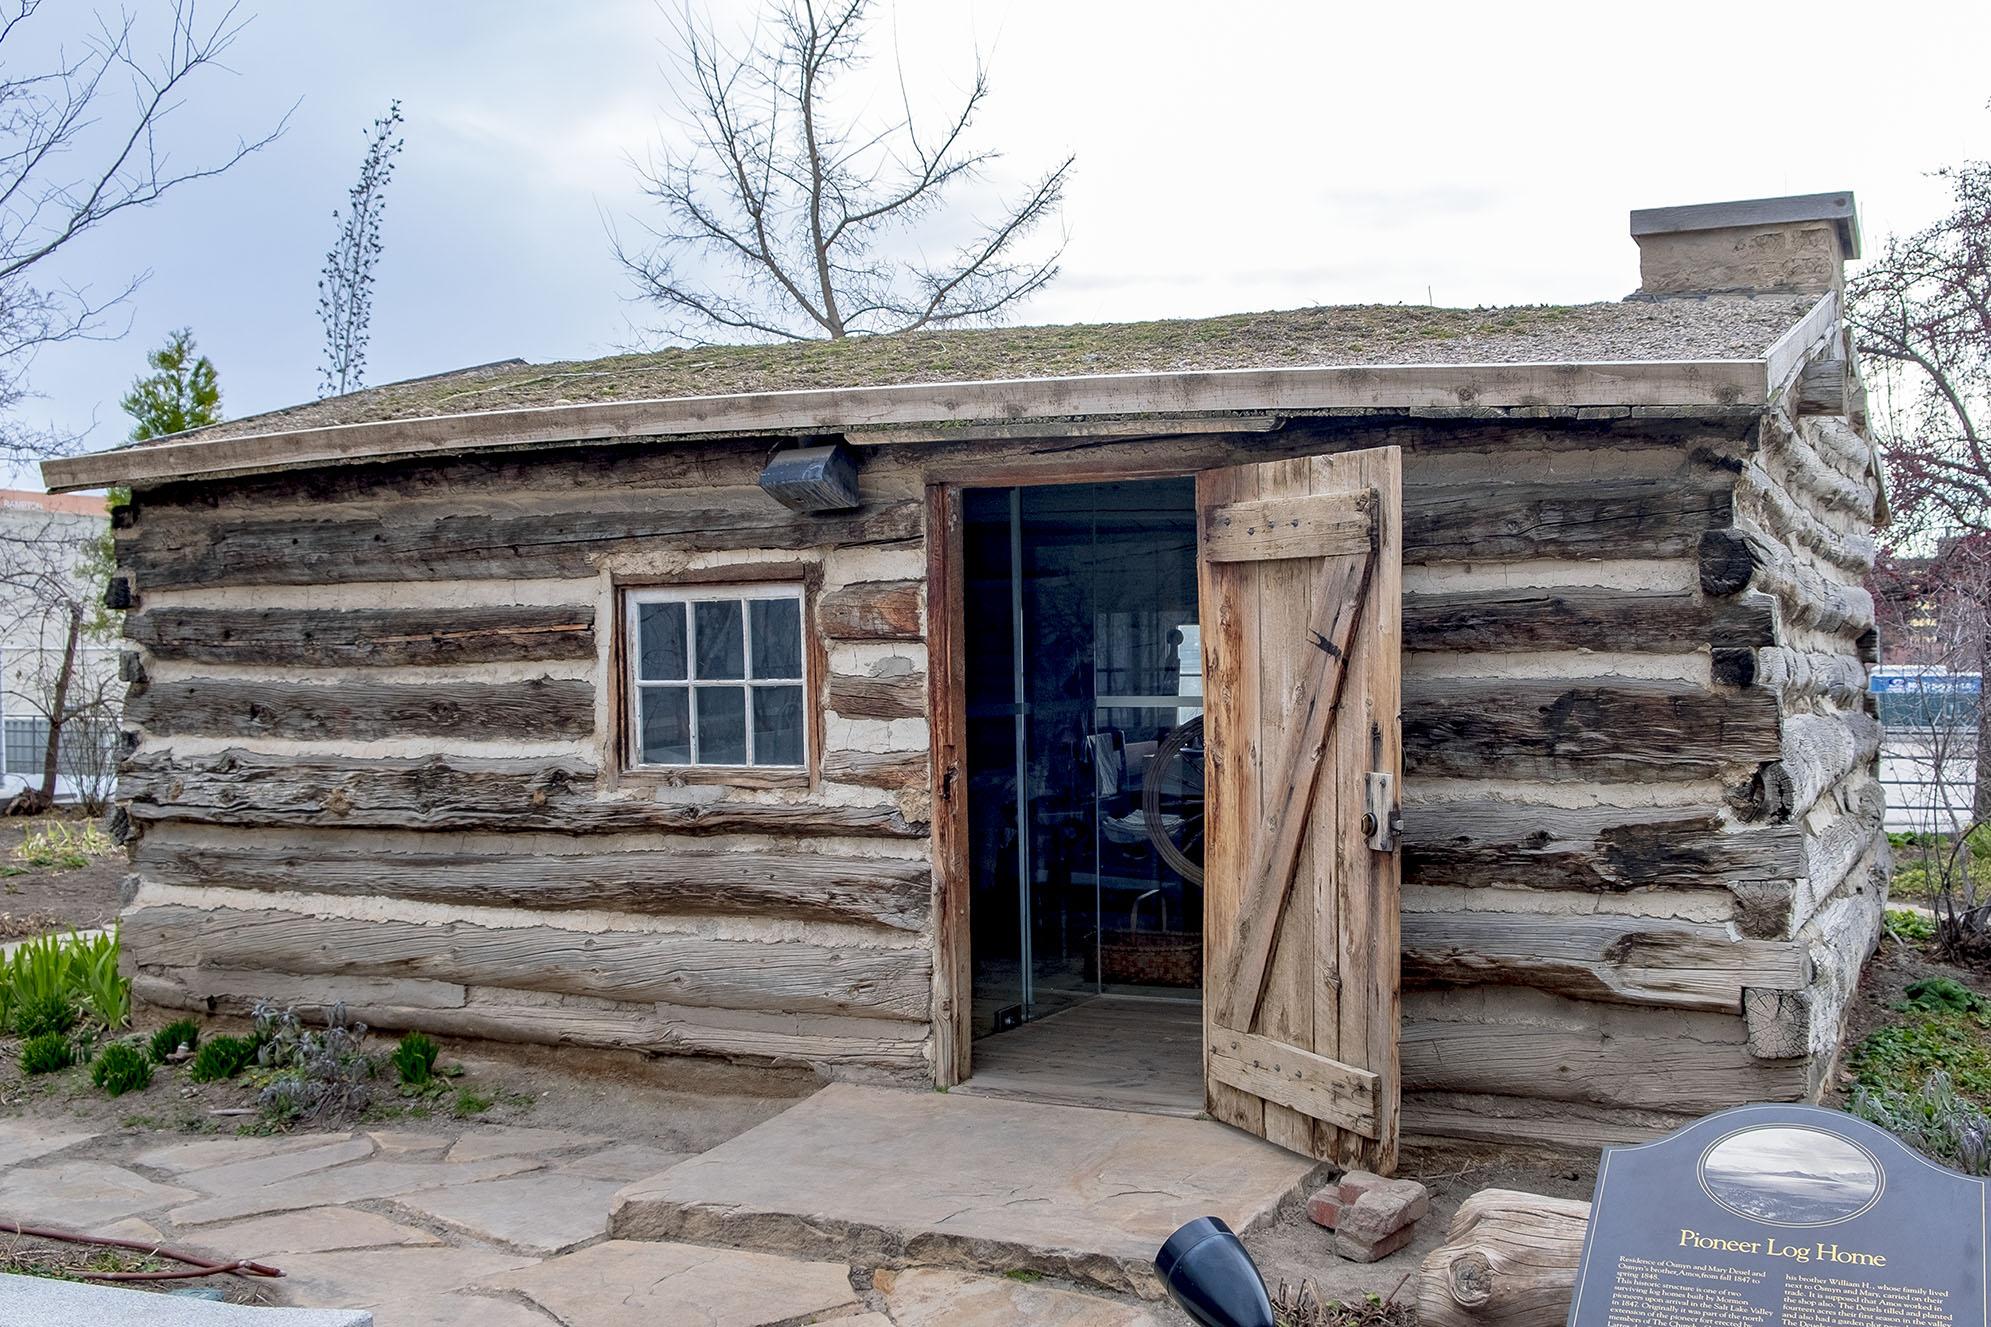 Pioneer Log Home Salt Lake City